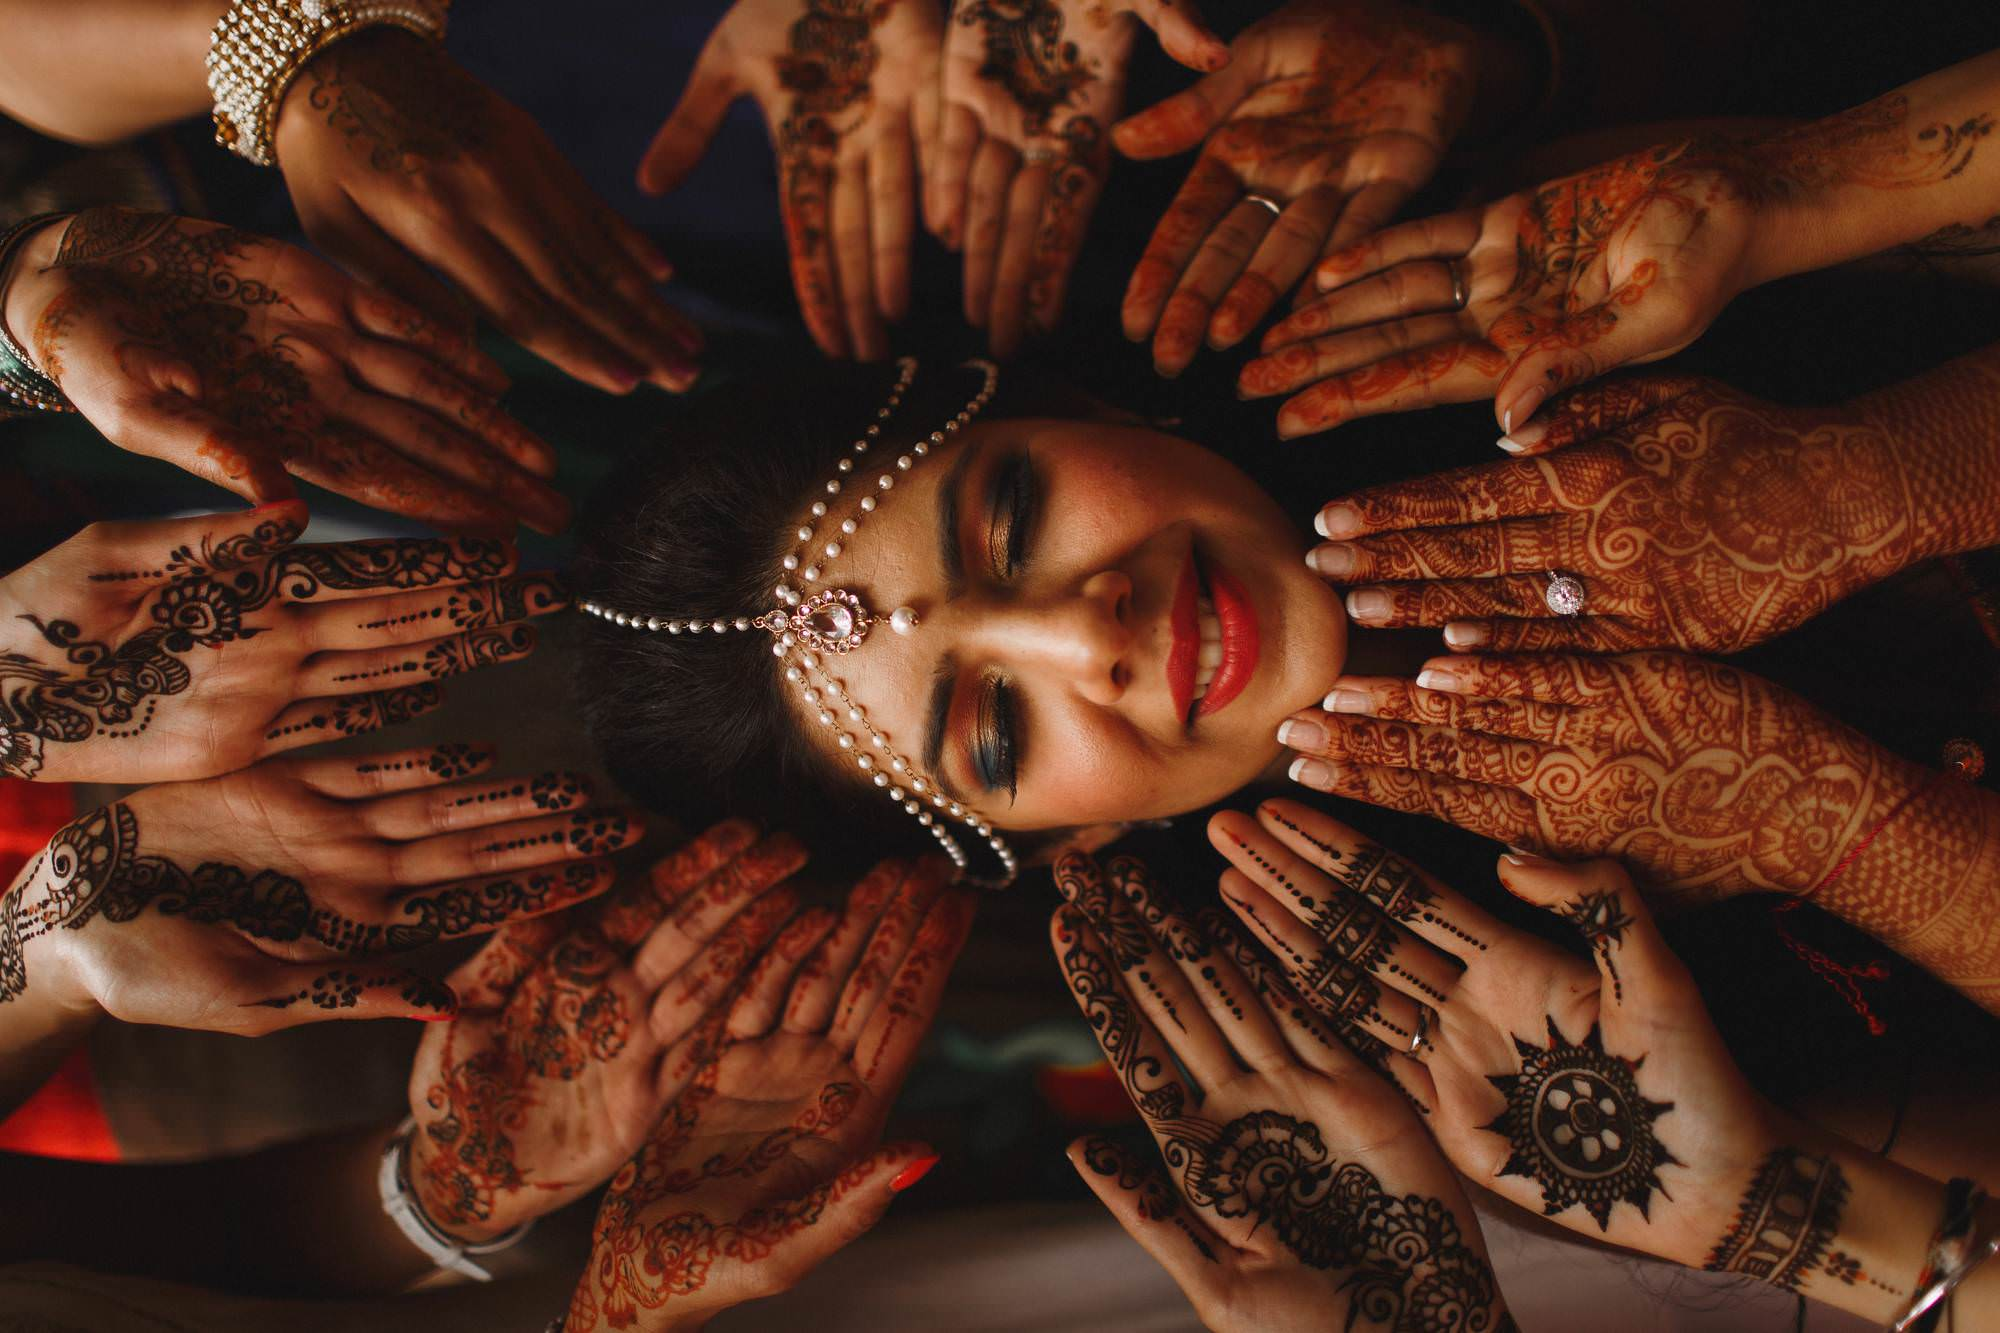 Destination wedding photography - Indian mehendi wedding photography